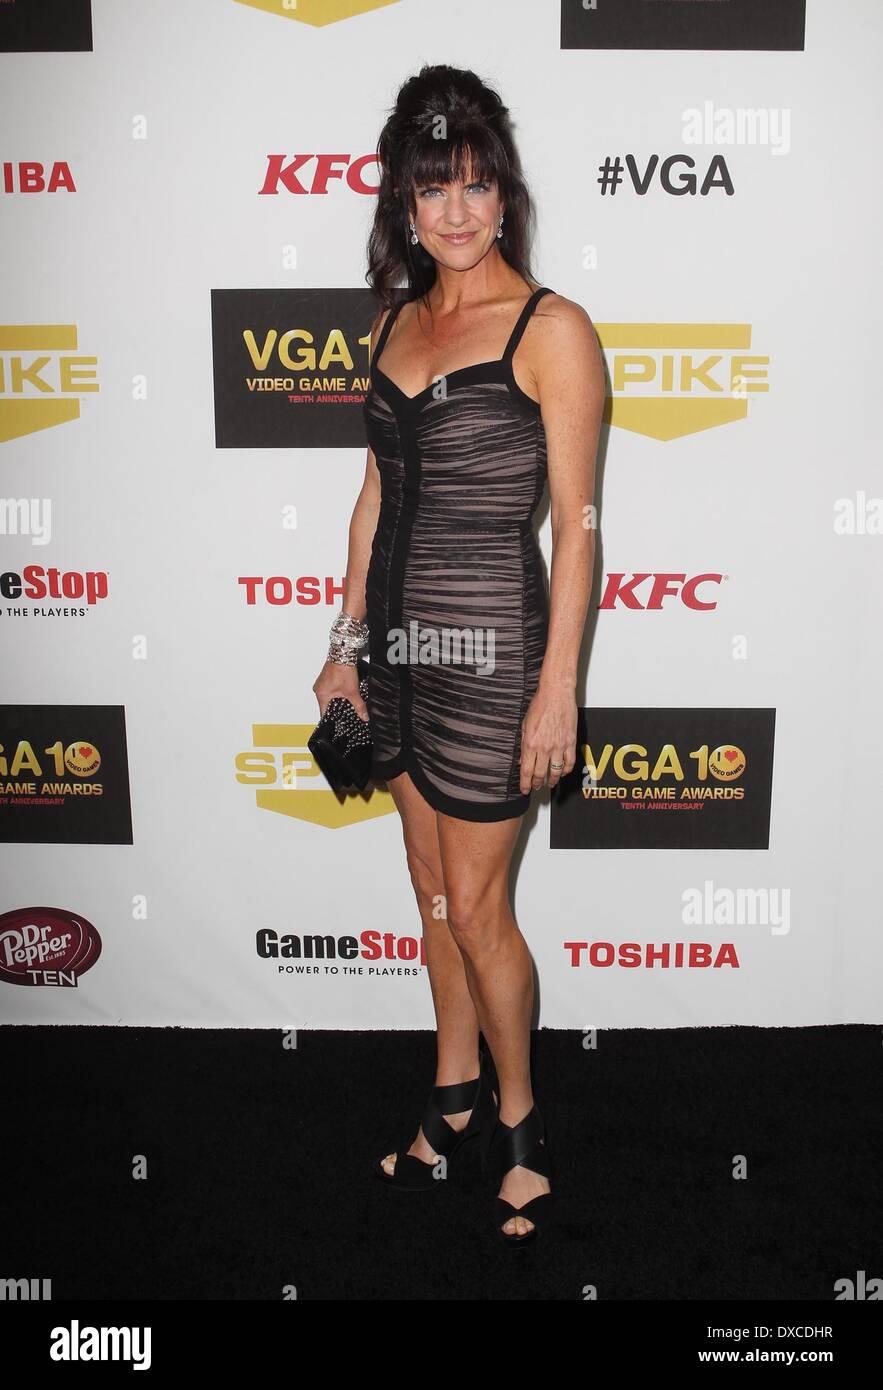 Erin Davis (actress),Ayesha Curry Erotic clips Vilayna LaSalle,Eamonn Walker (born 1962)